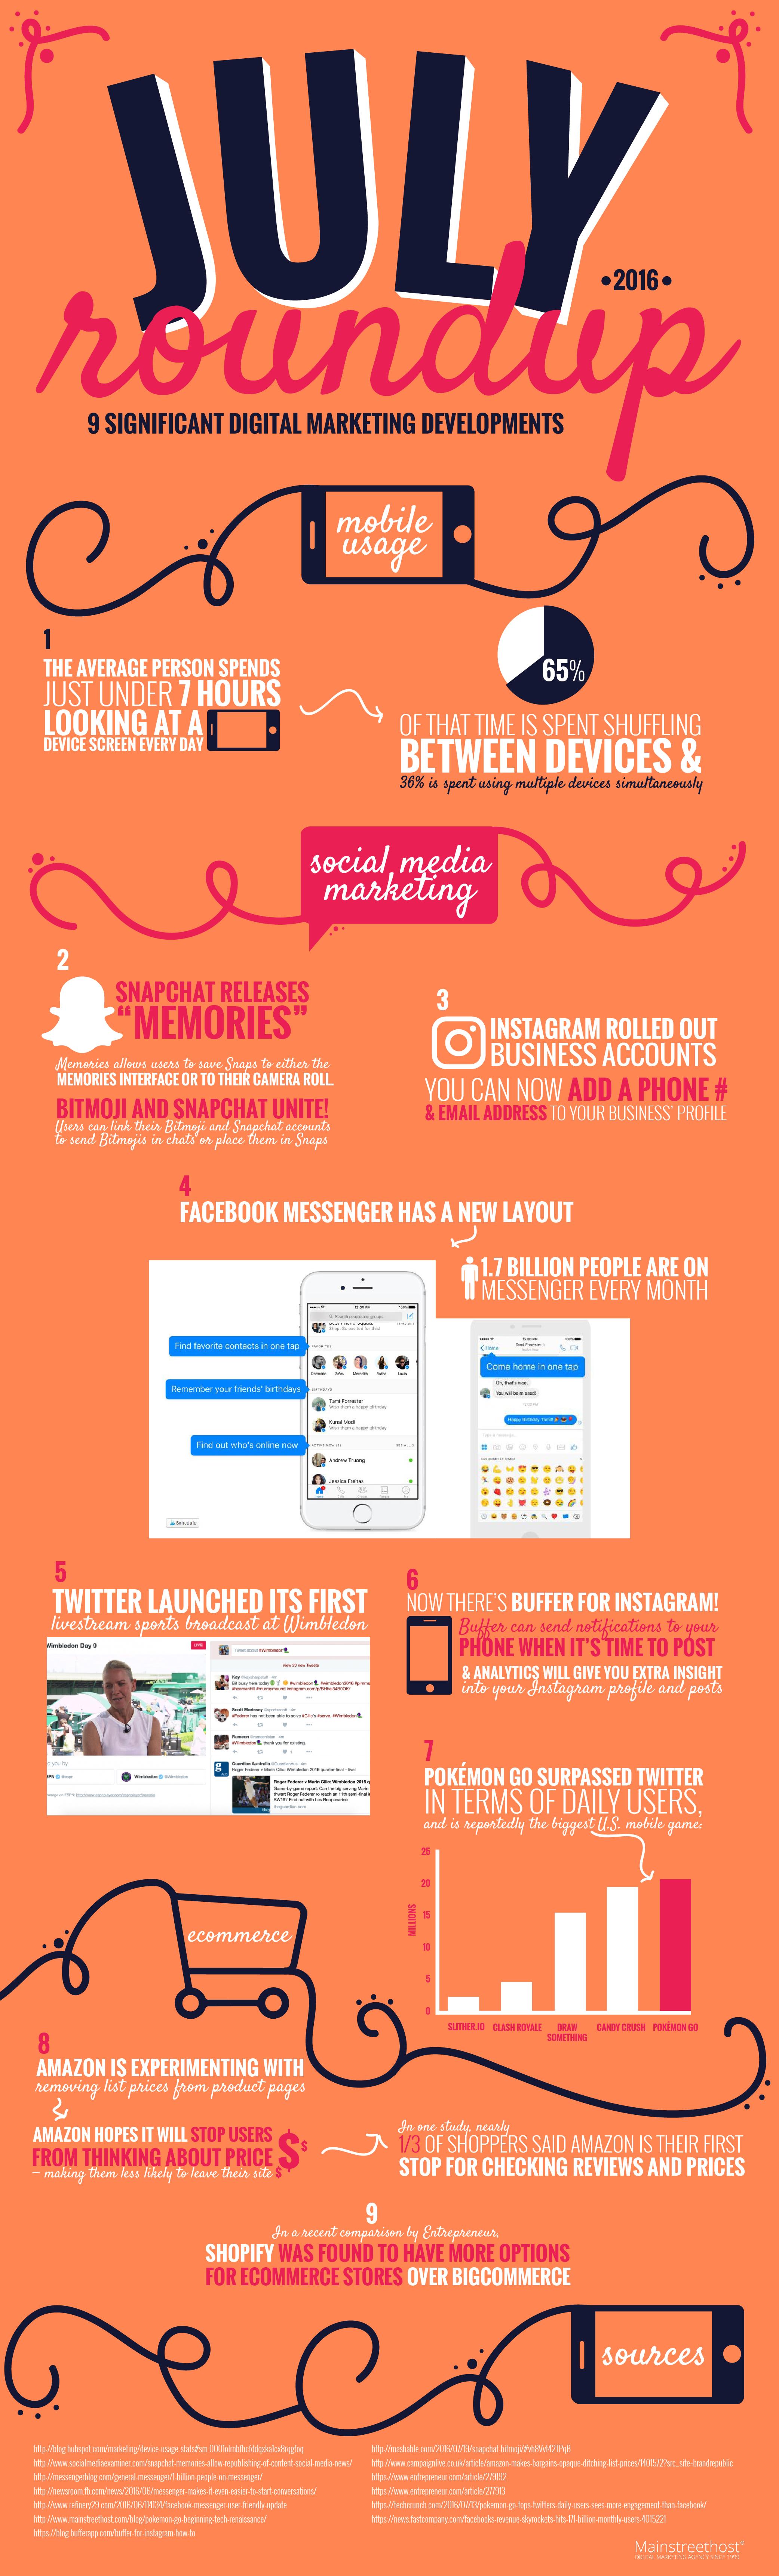 July Digital Marketing Roundup Infographic